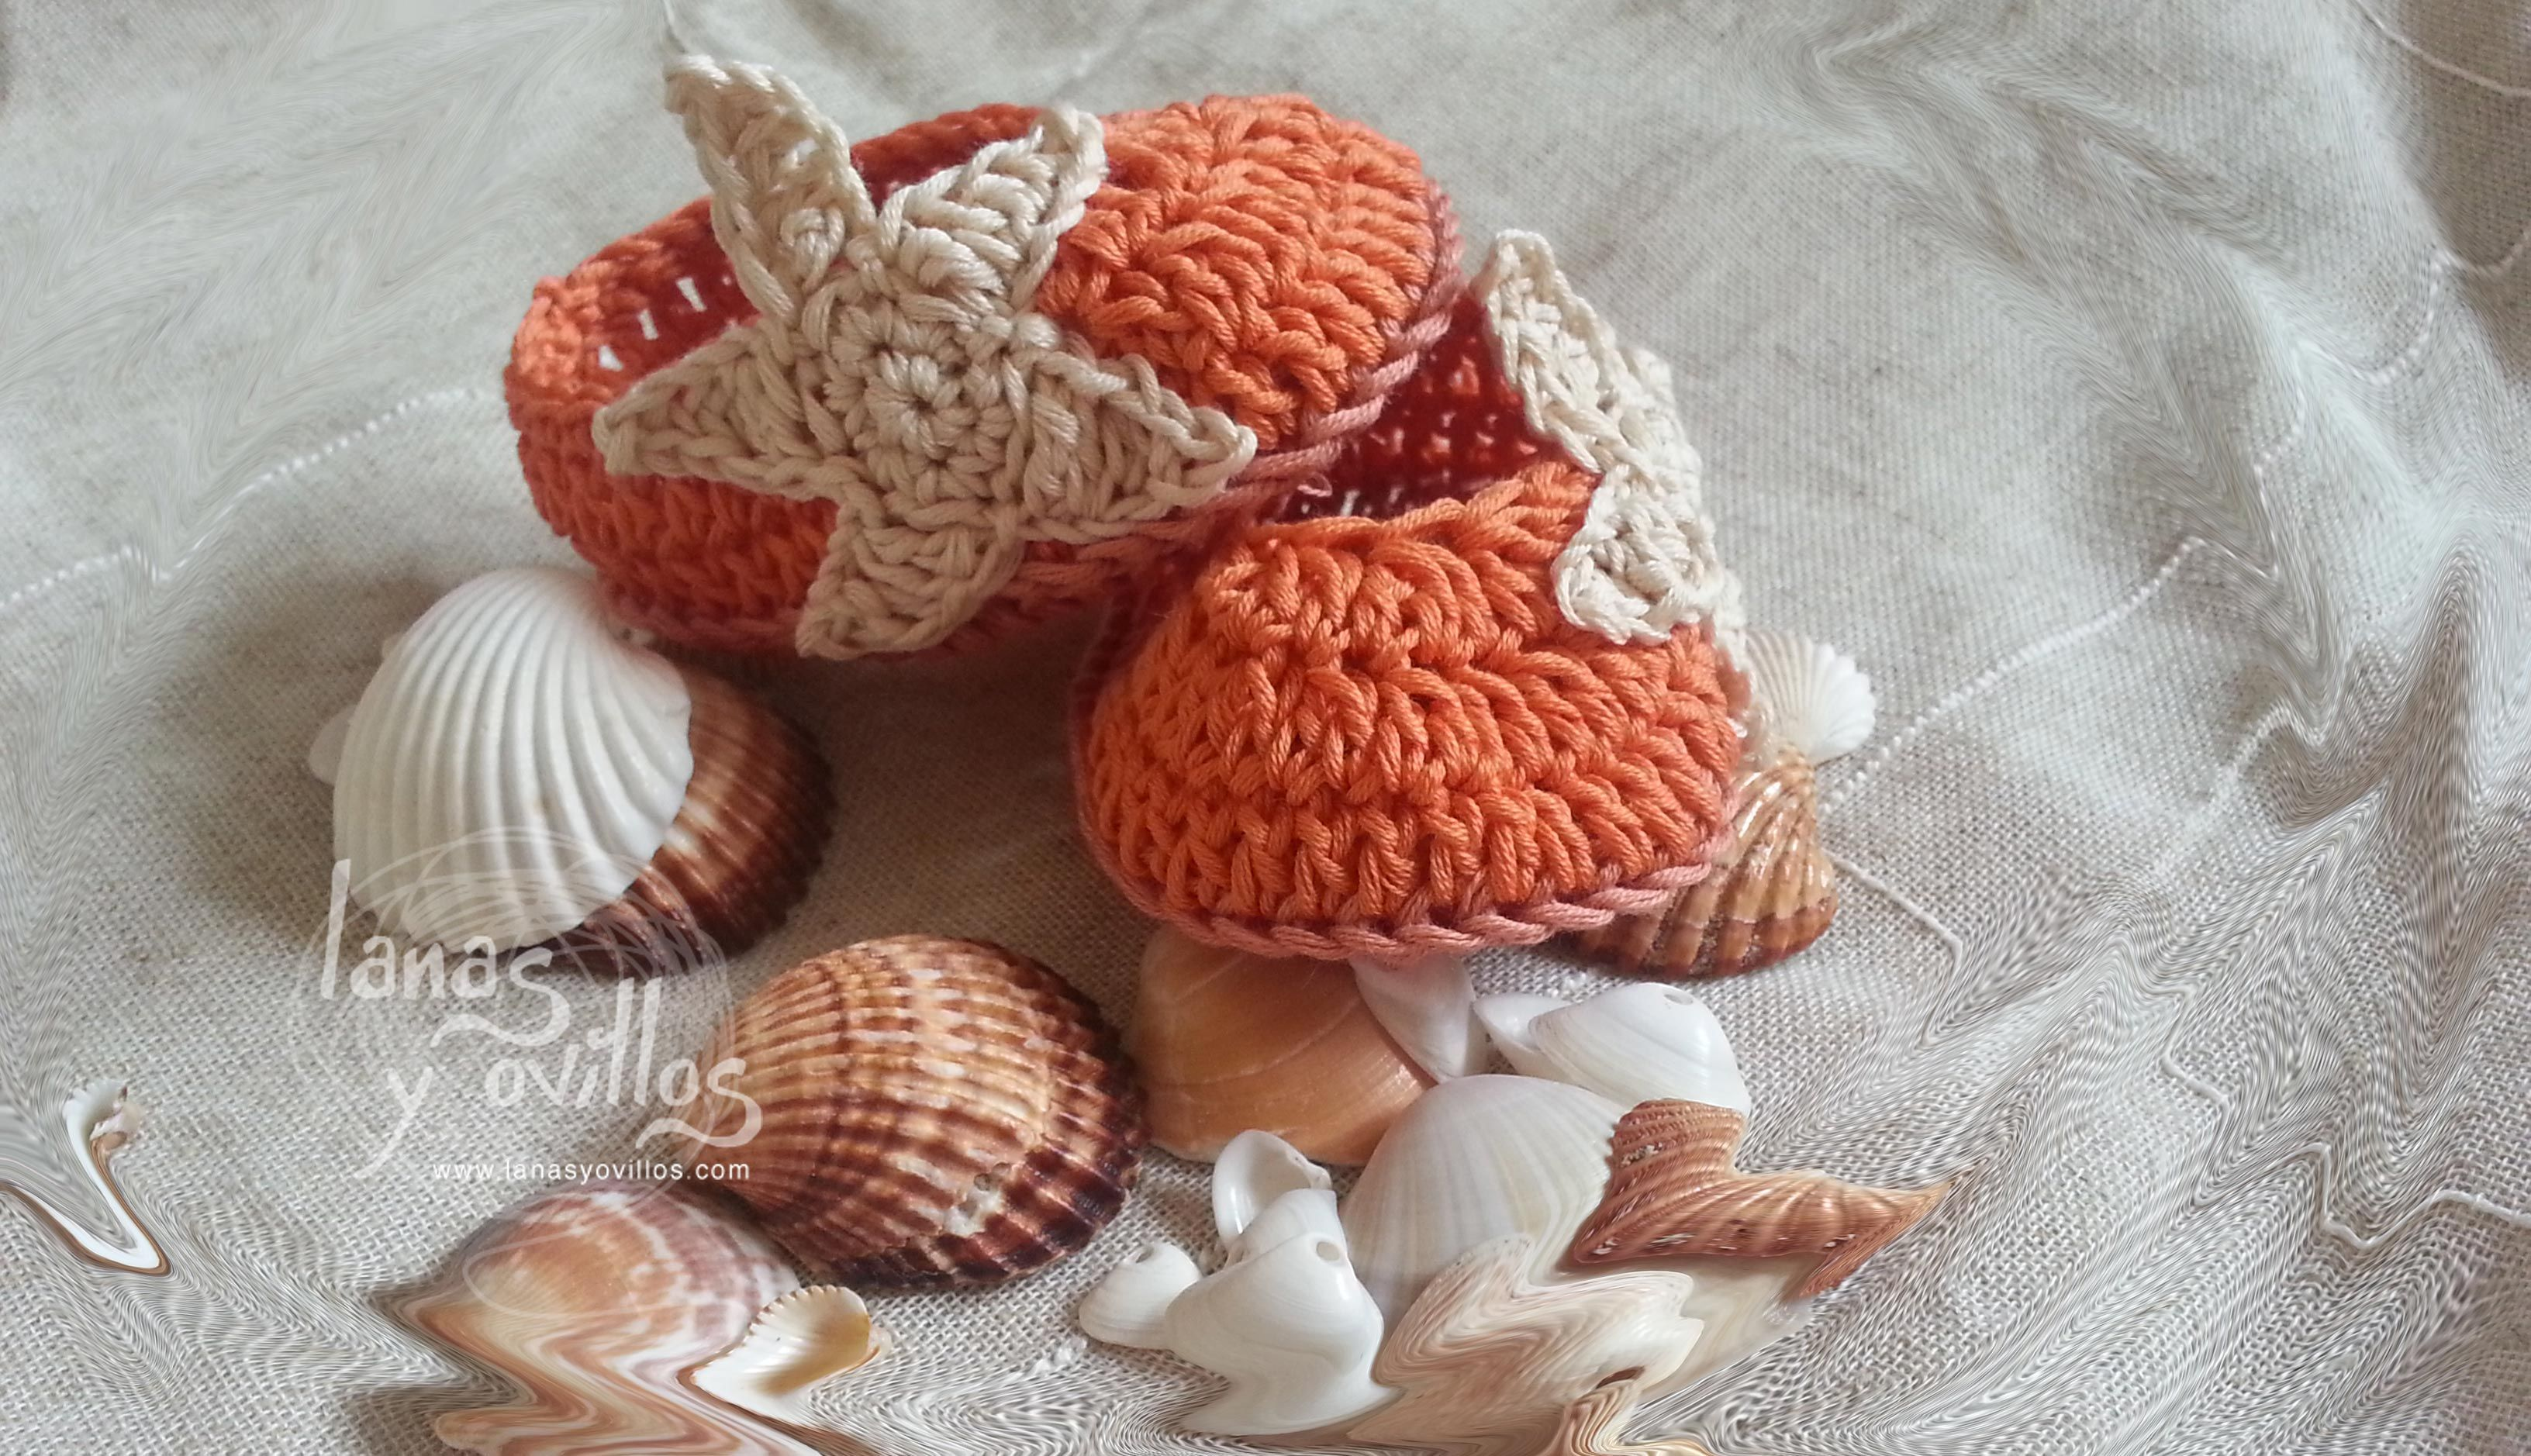 sandalias bebe crochet patron gratis baby booties | Proyectos que ...